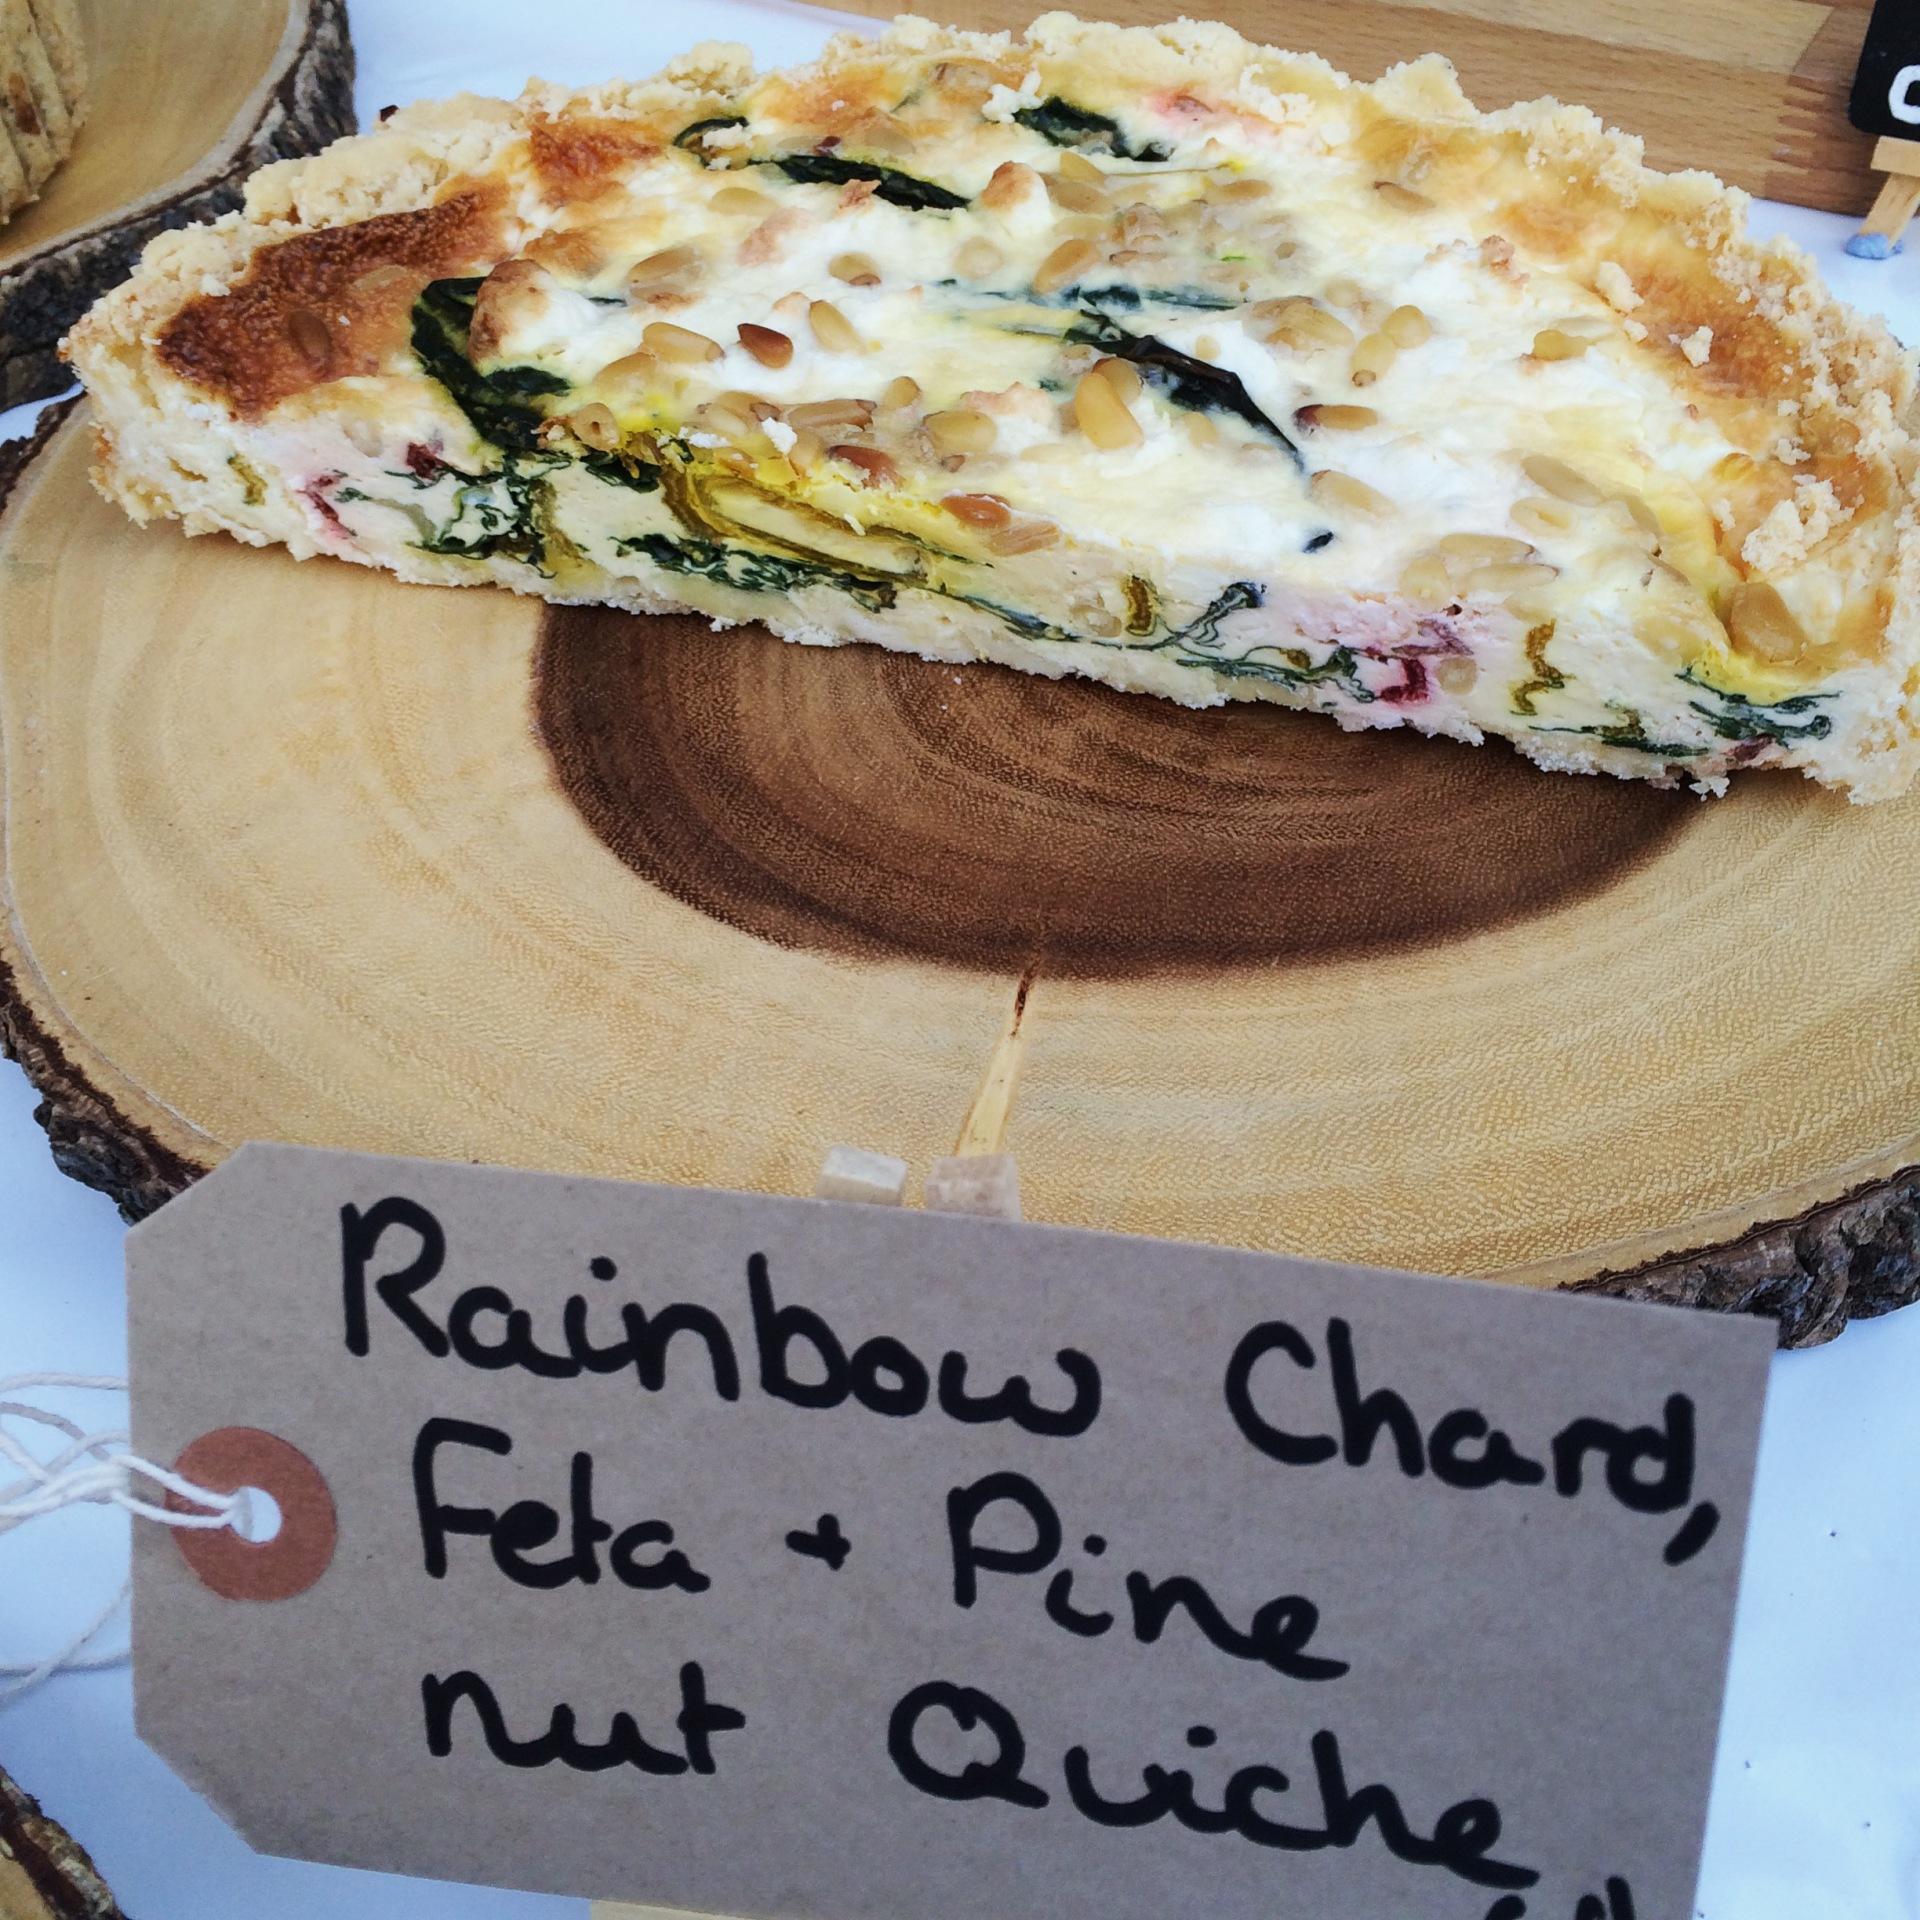 Rainbow Chard, Feta and Pine Nut Quiche